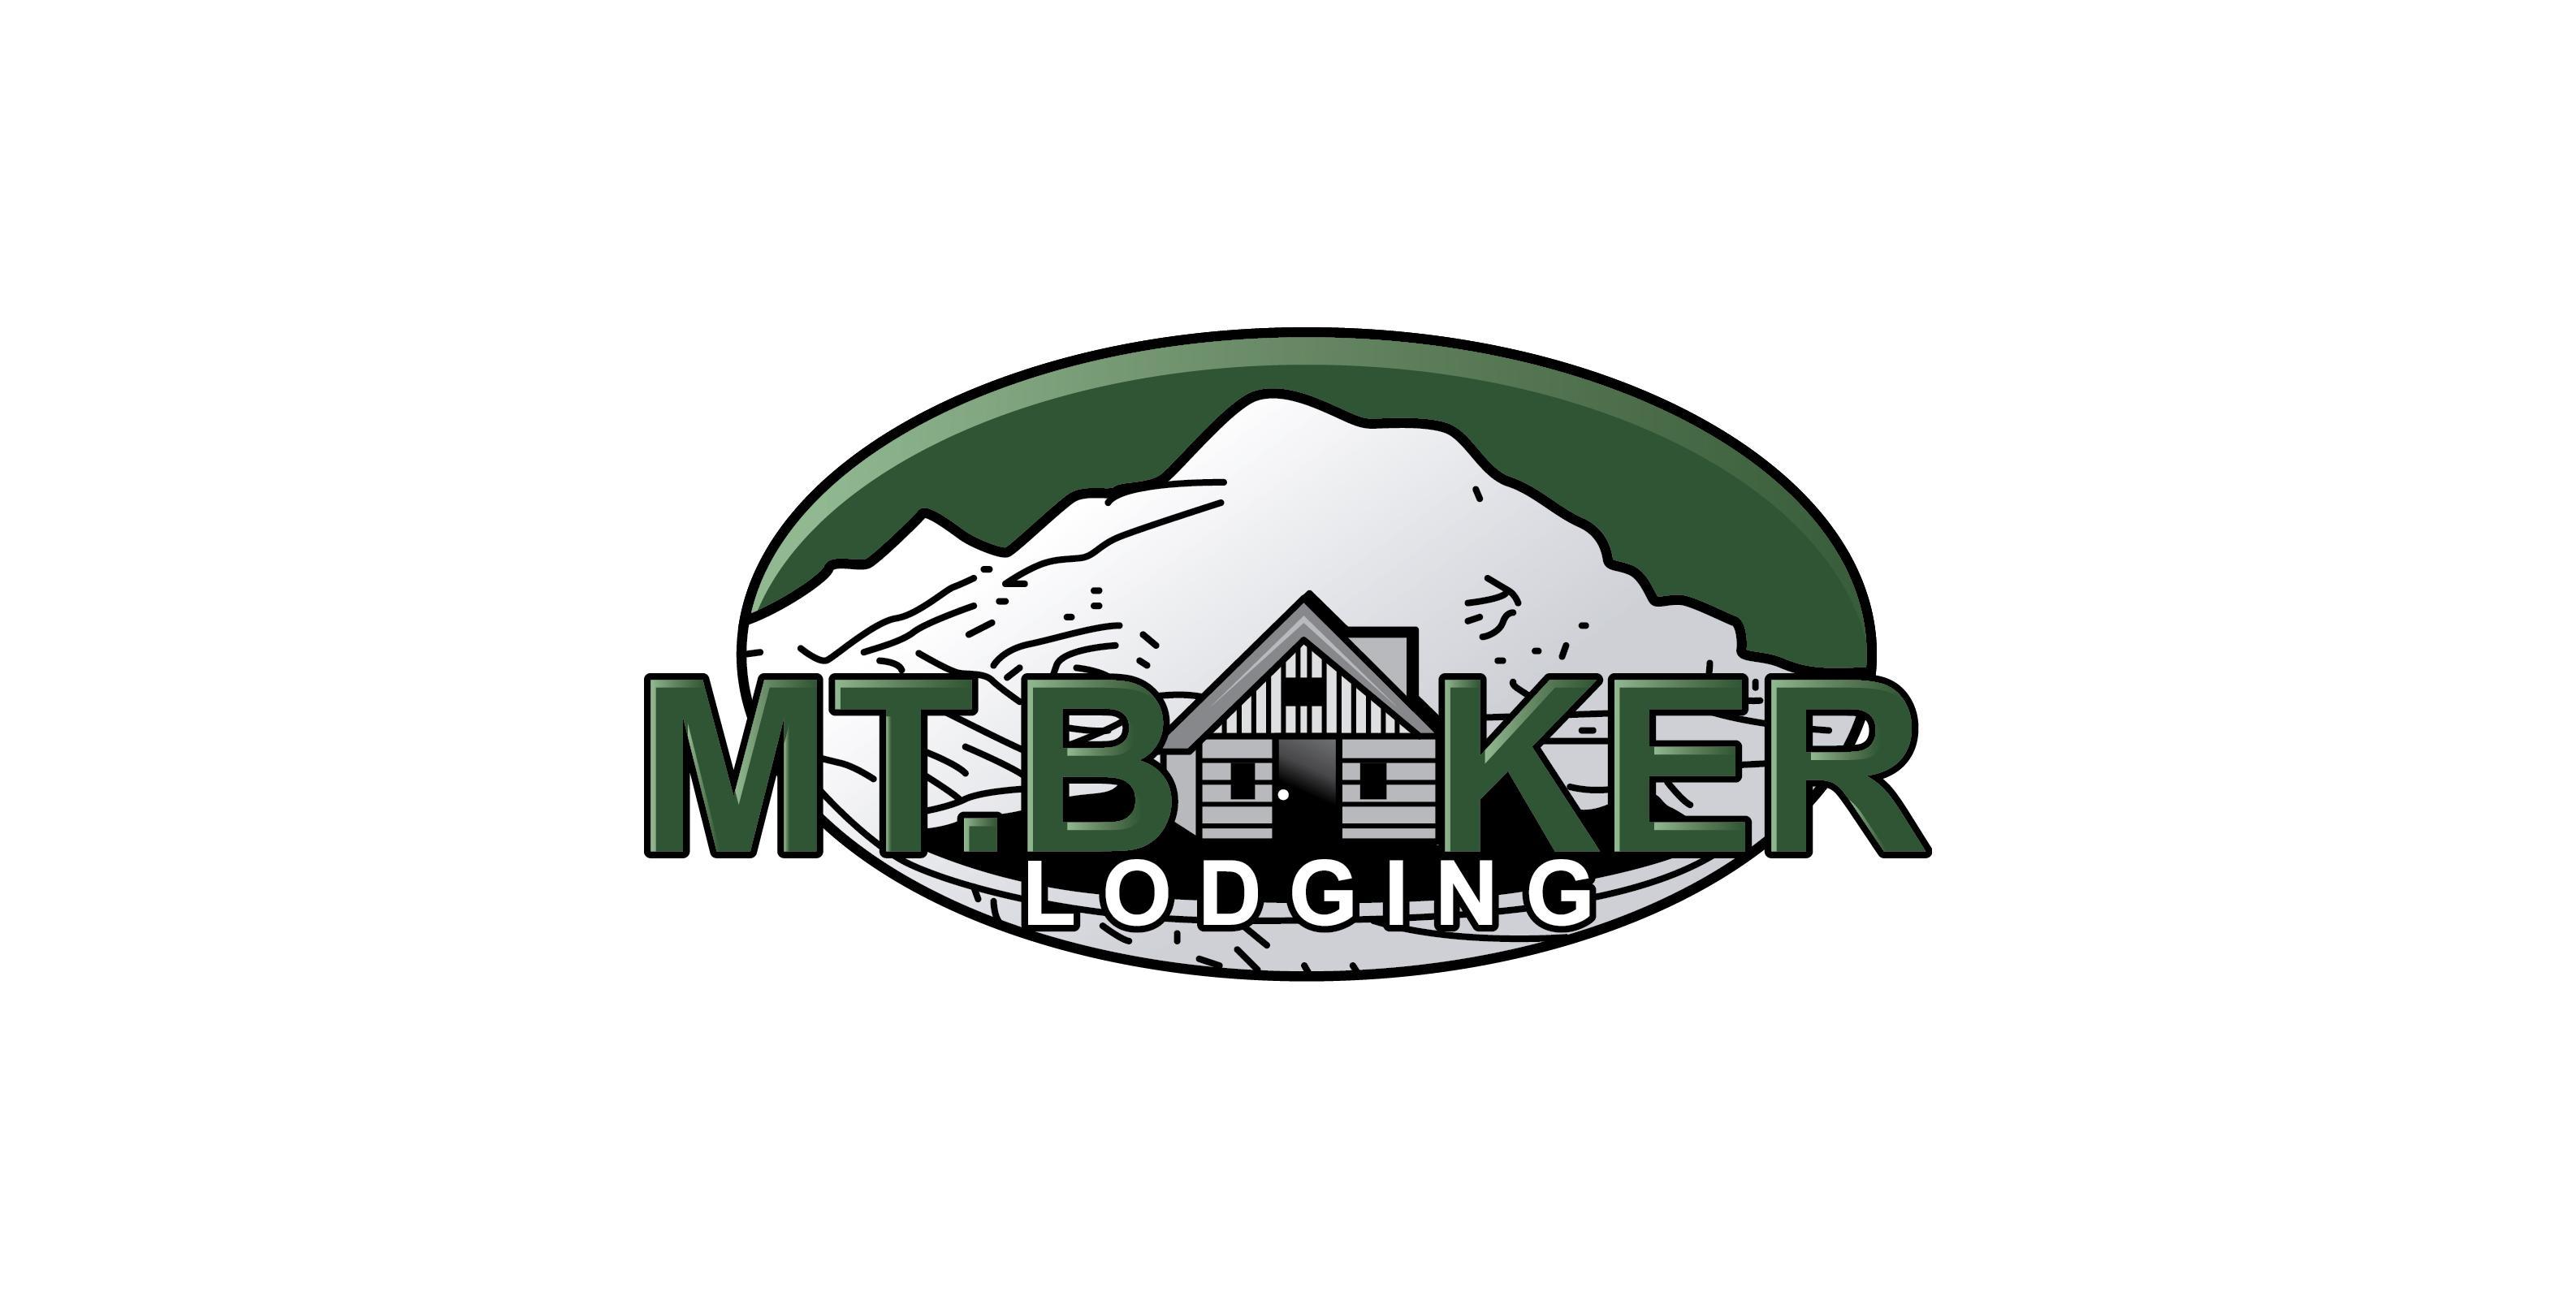 Apartment Mt  Baker Lodging Cabin  30  ndash  HOT TUB  WIFI  DVD  BBQ  W D  DW  SLEEPS 8  photo 31816826